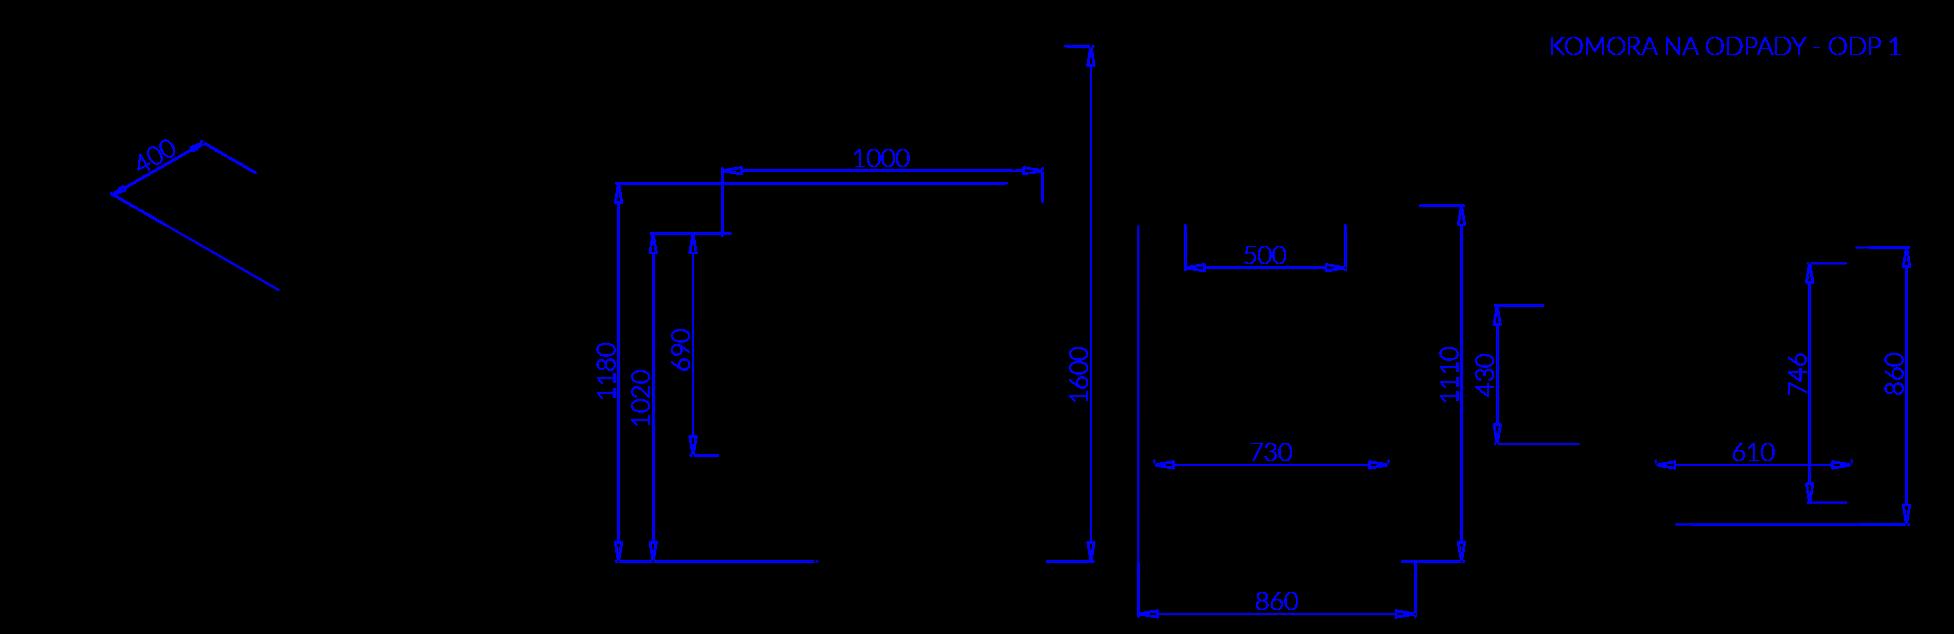 Technical drawing Waste chamber KOMORA ODP 1